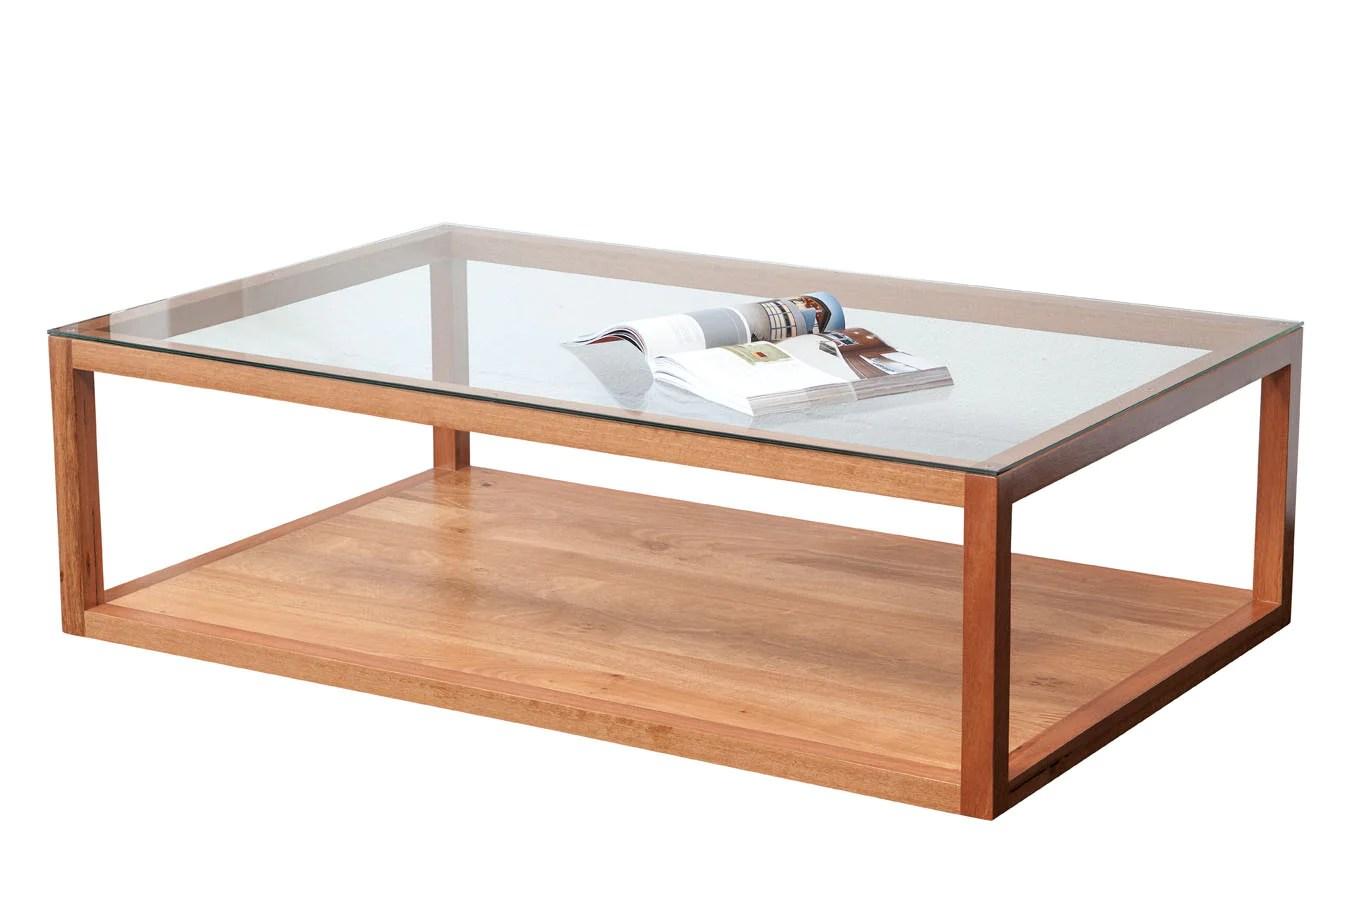 sofa tables perth wa harris tweed sofas uk made bailey blackbutt coffee table with glass top bespoke